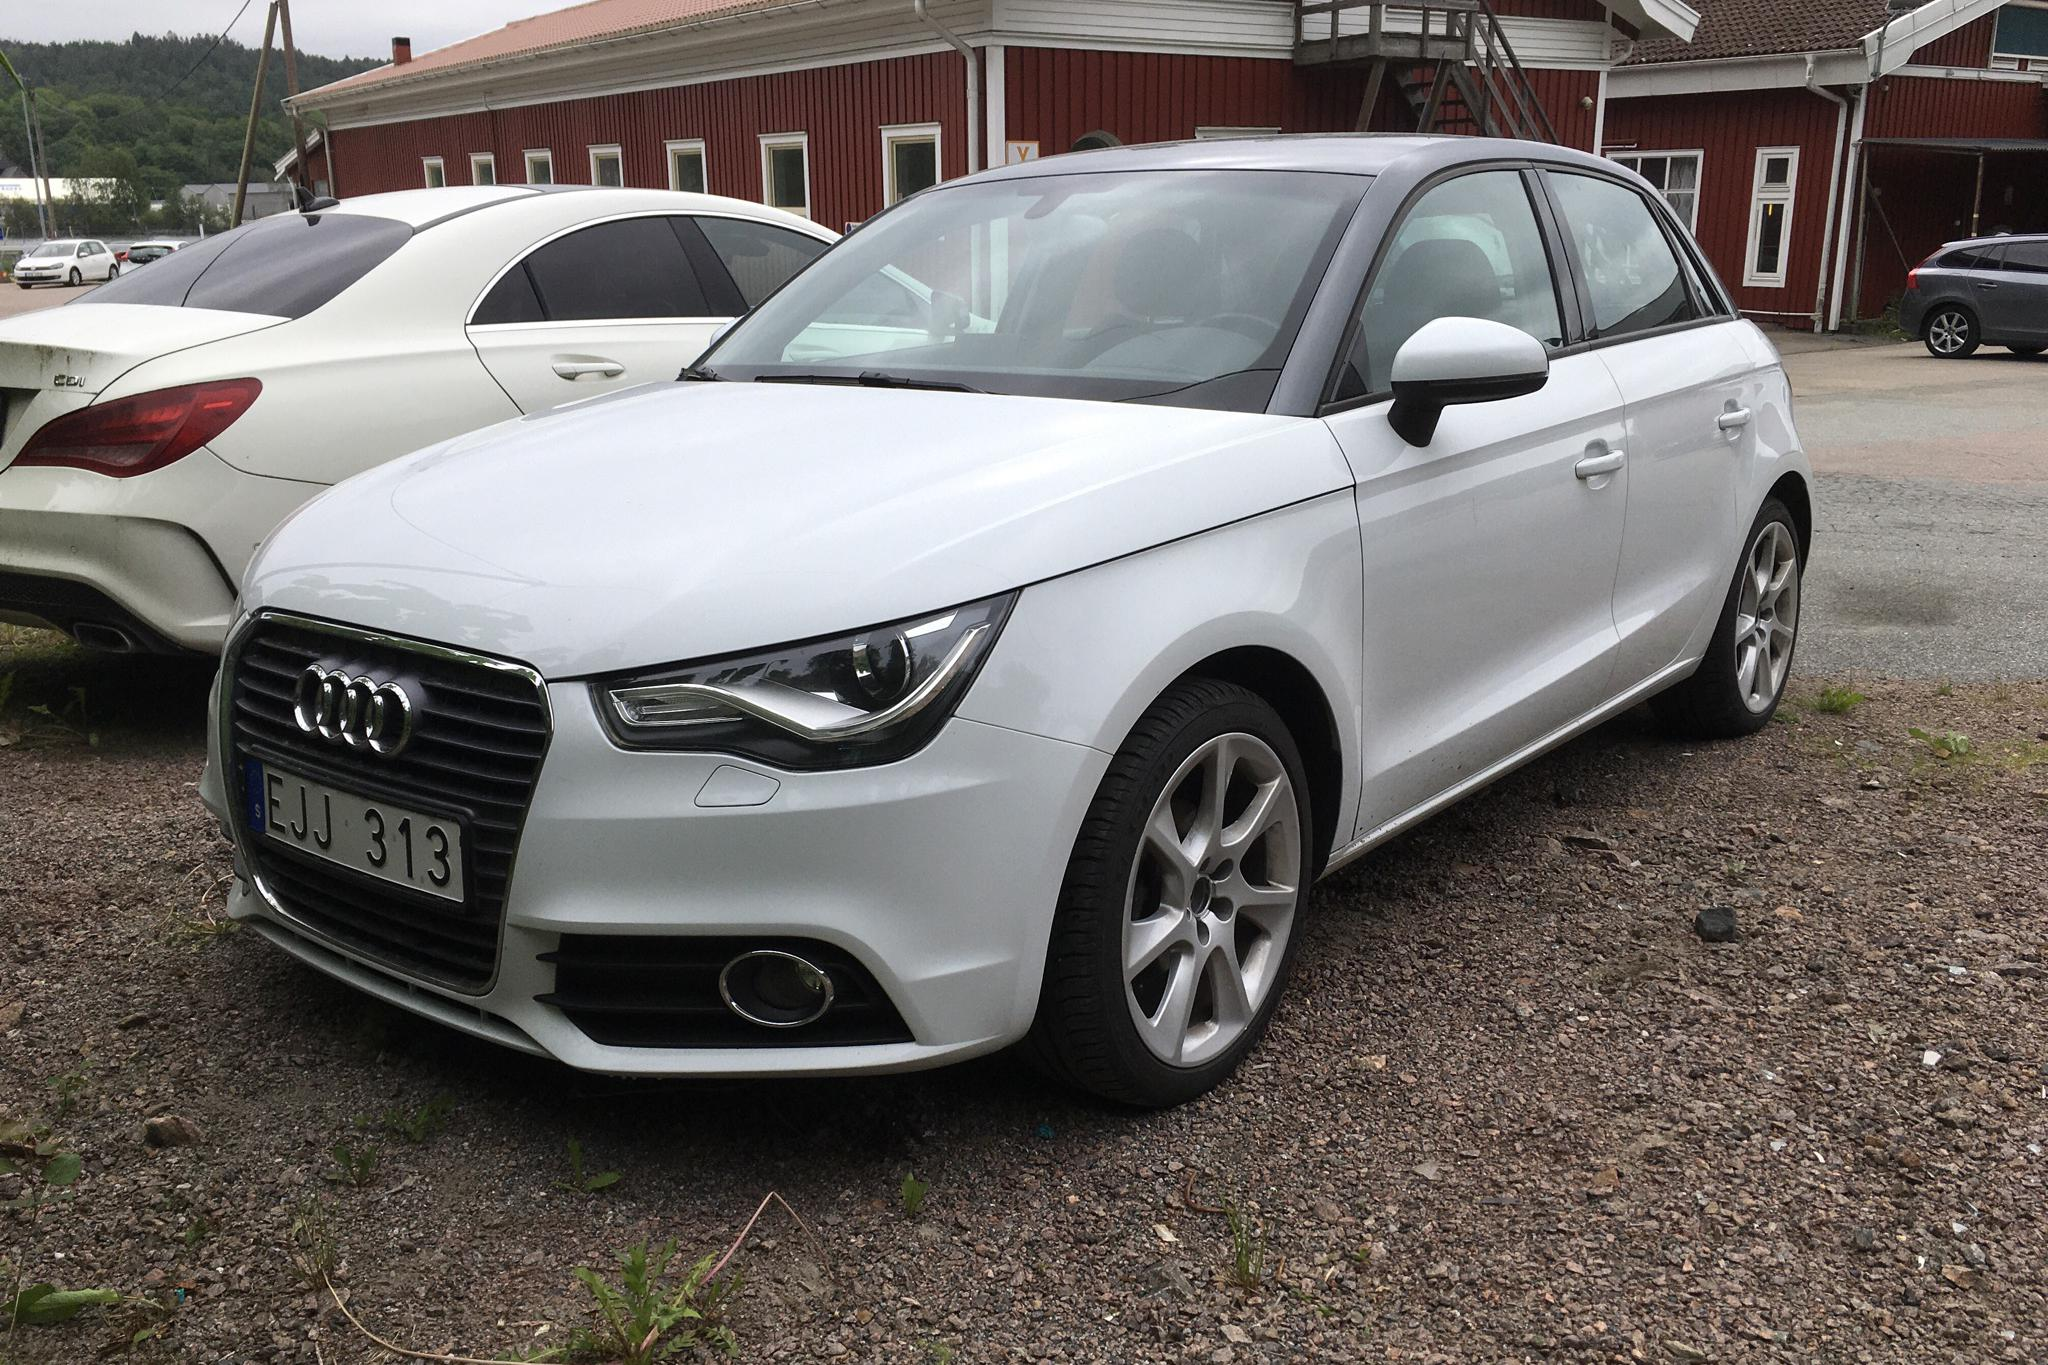 Audi A1 1.6 TDI Sportback (90hk) - 117 300 km - Automatic - white - 2013